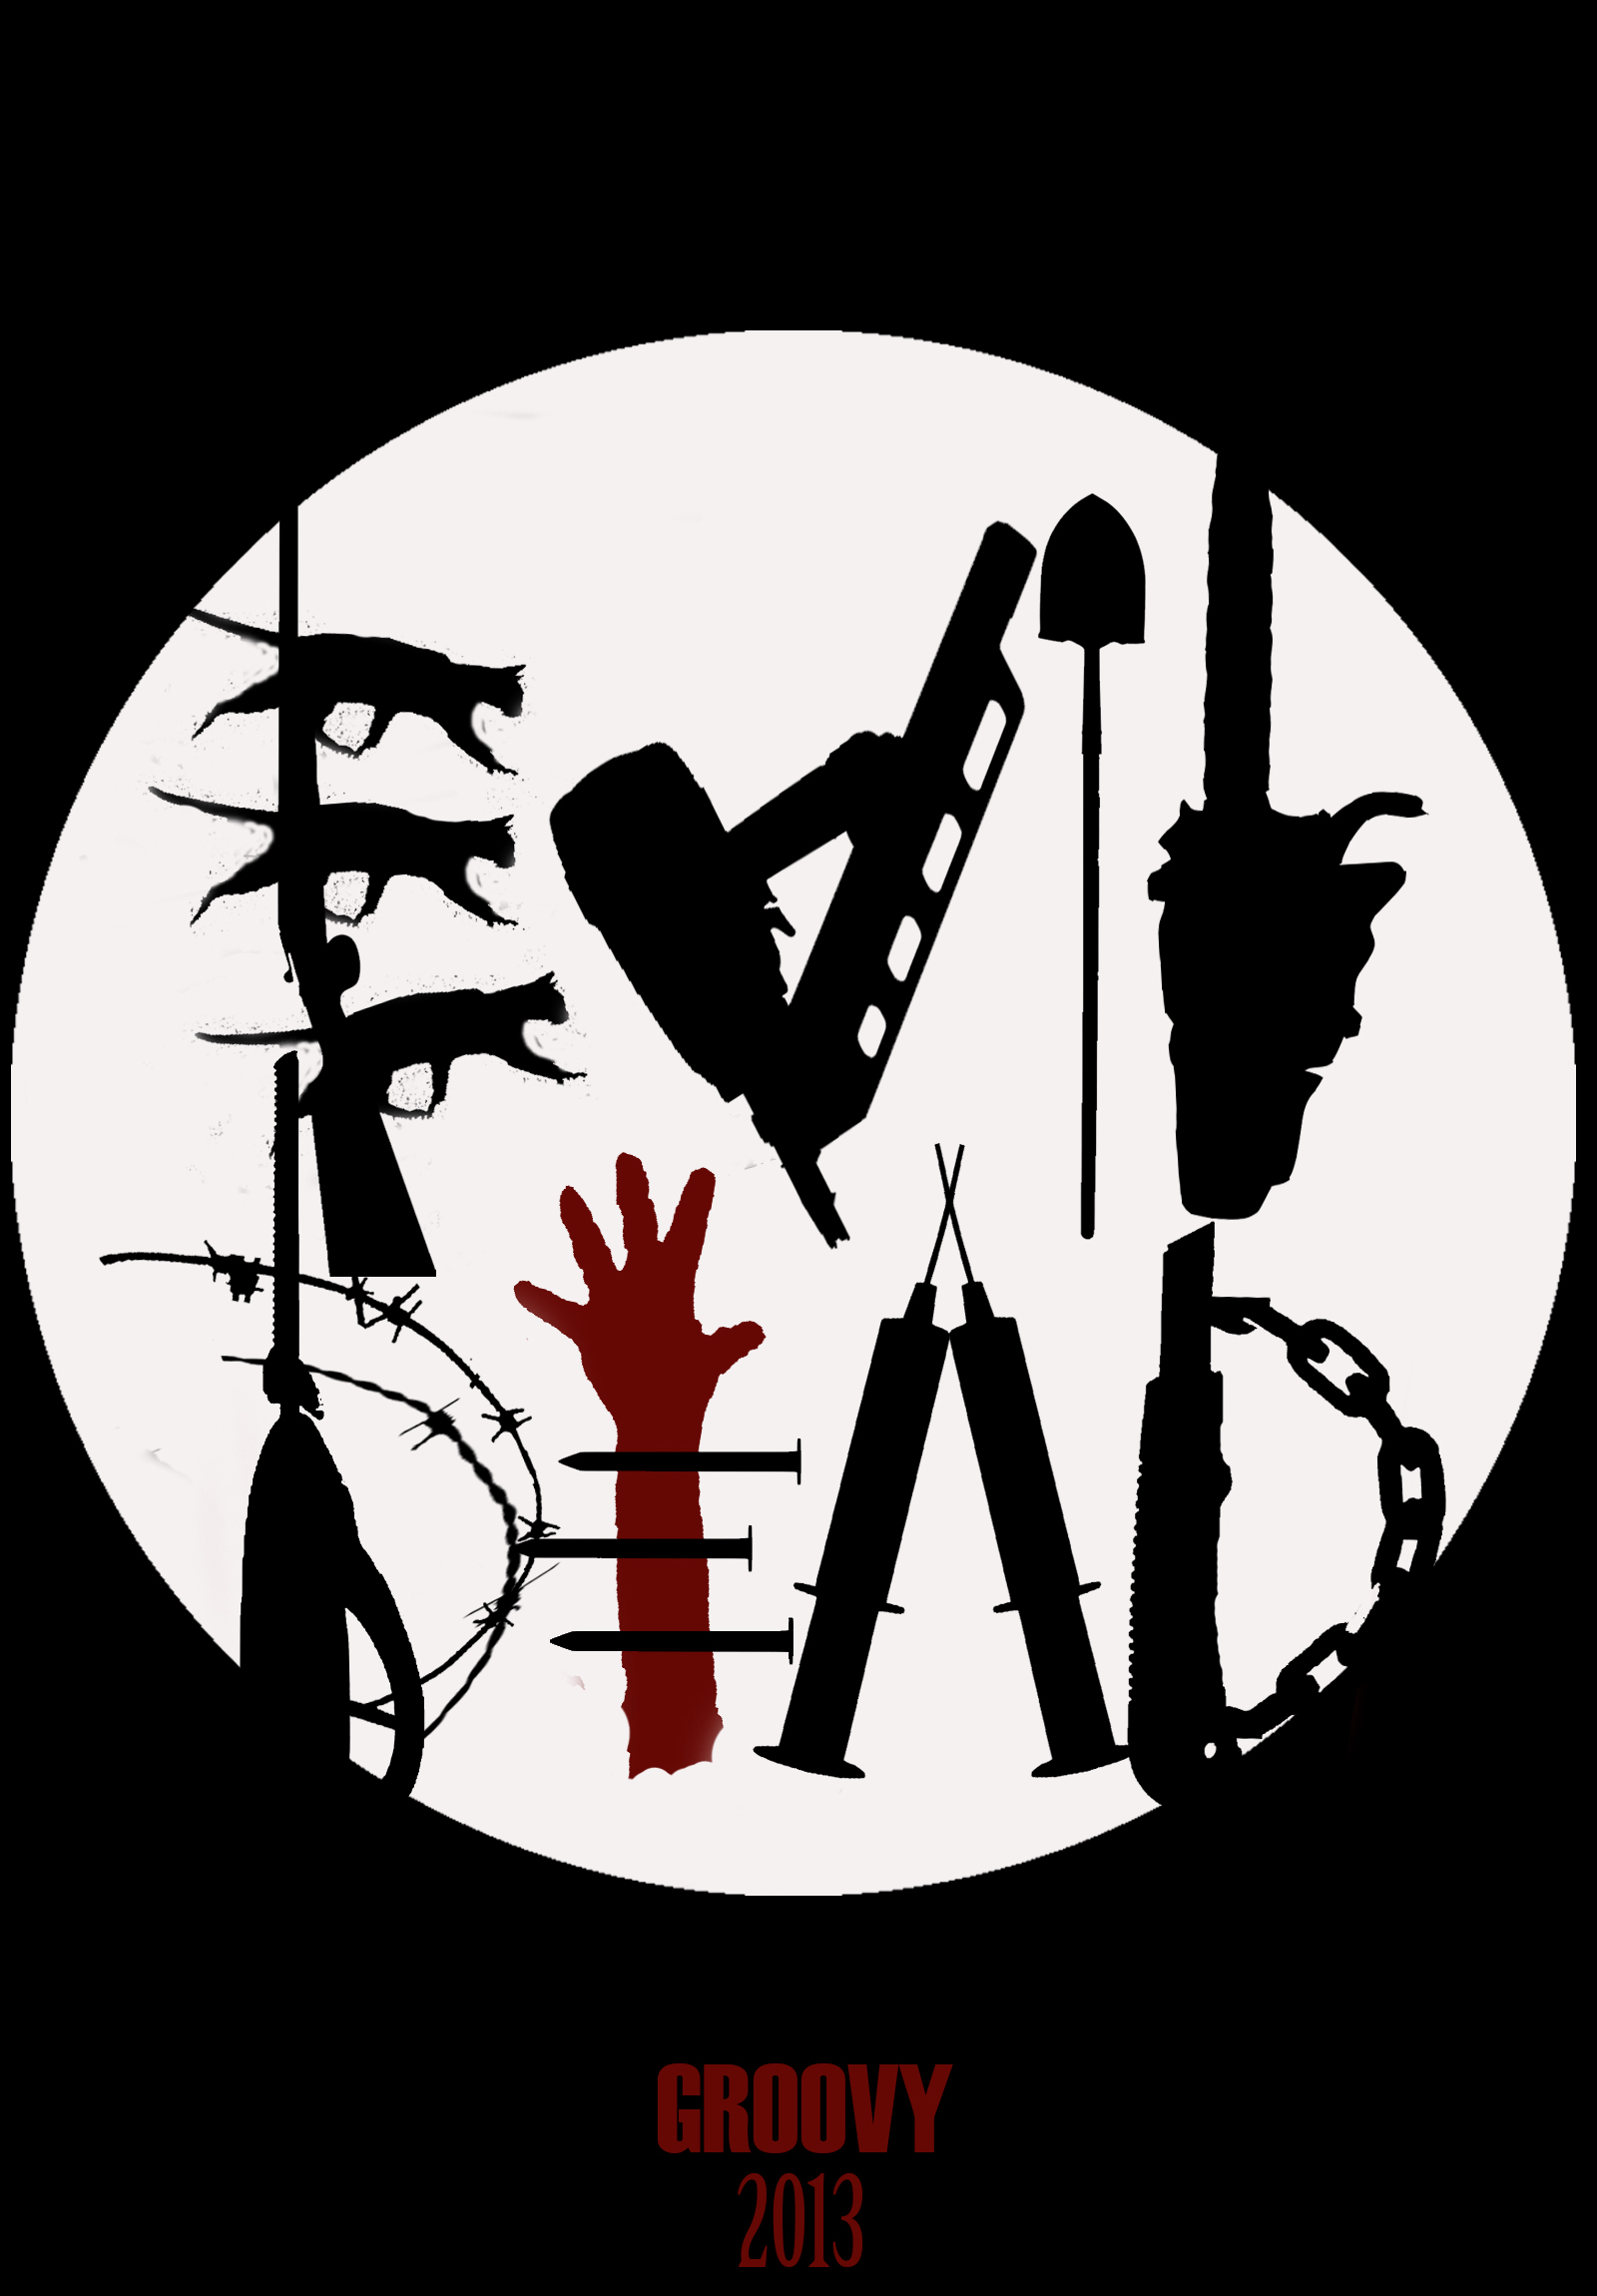 evildeadposter3.jpg